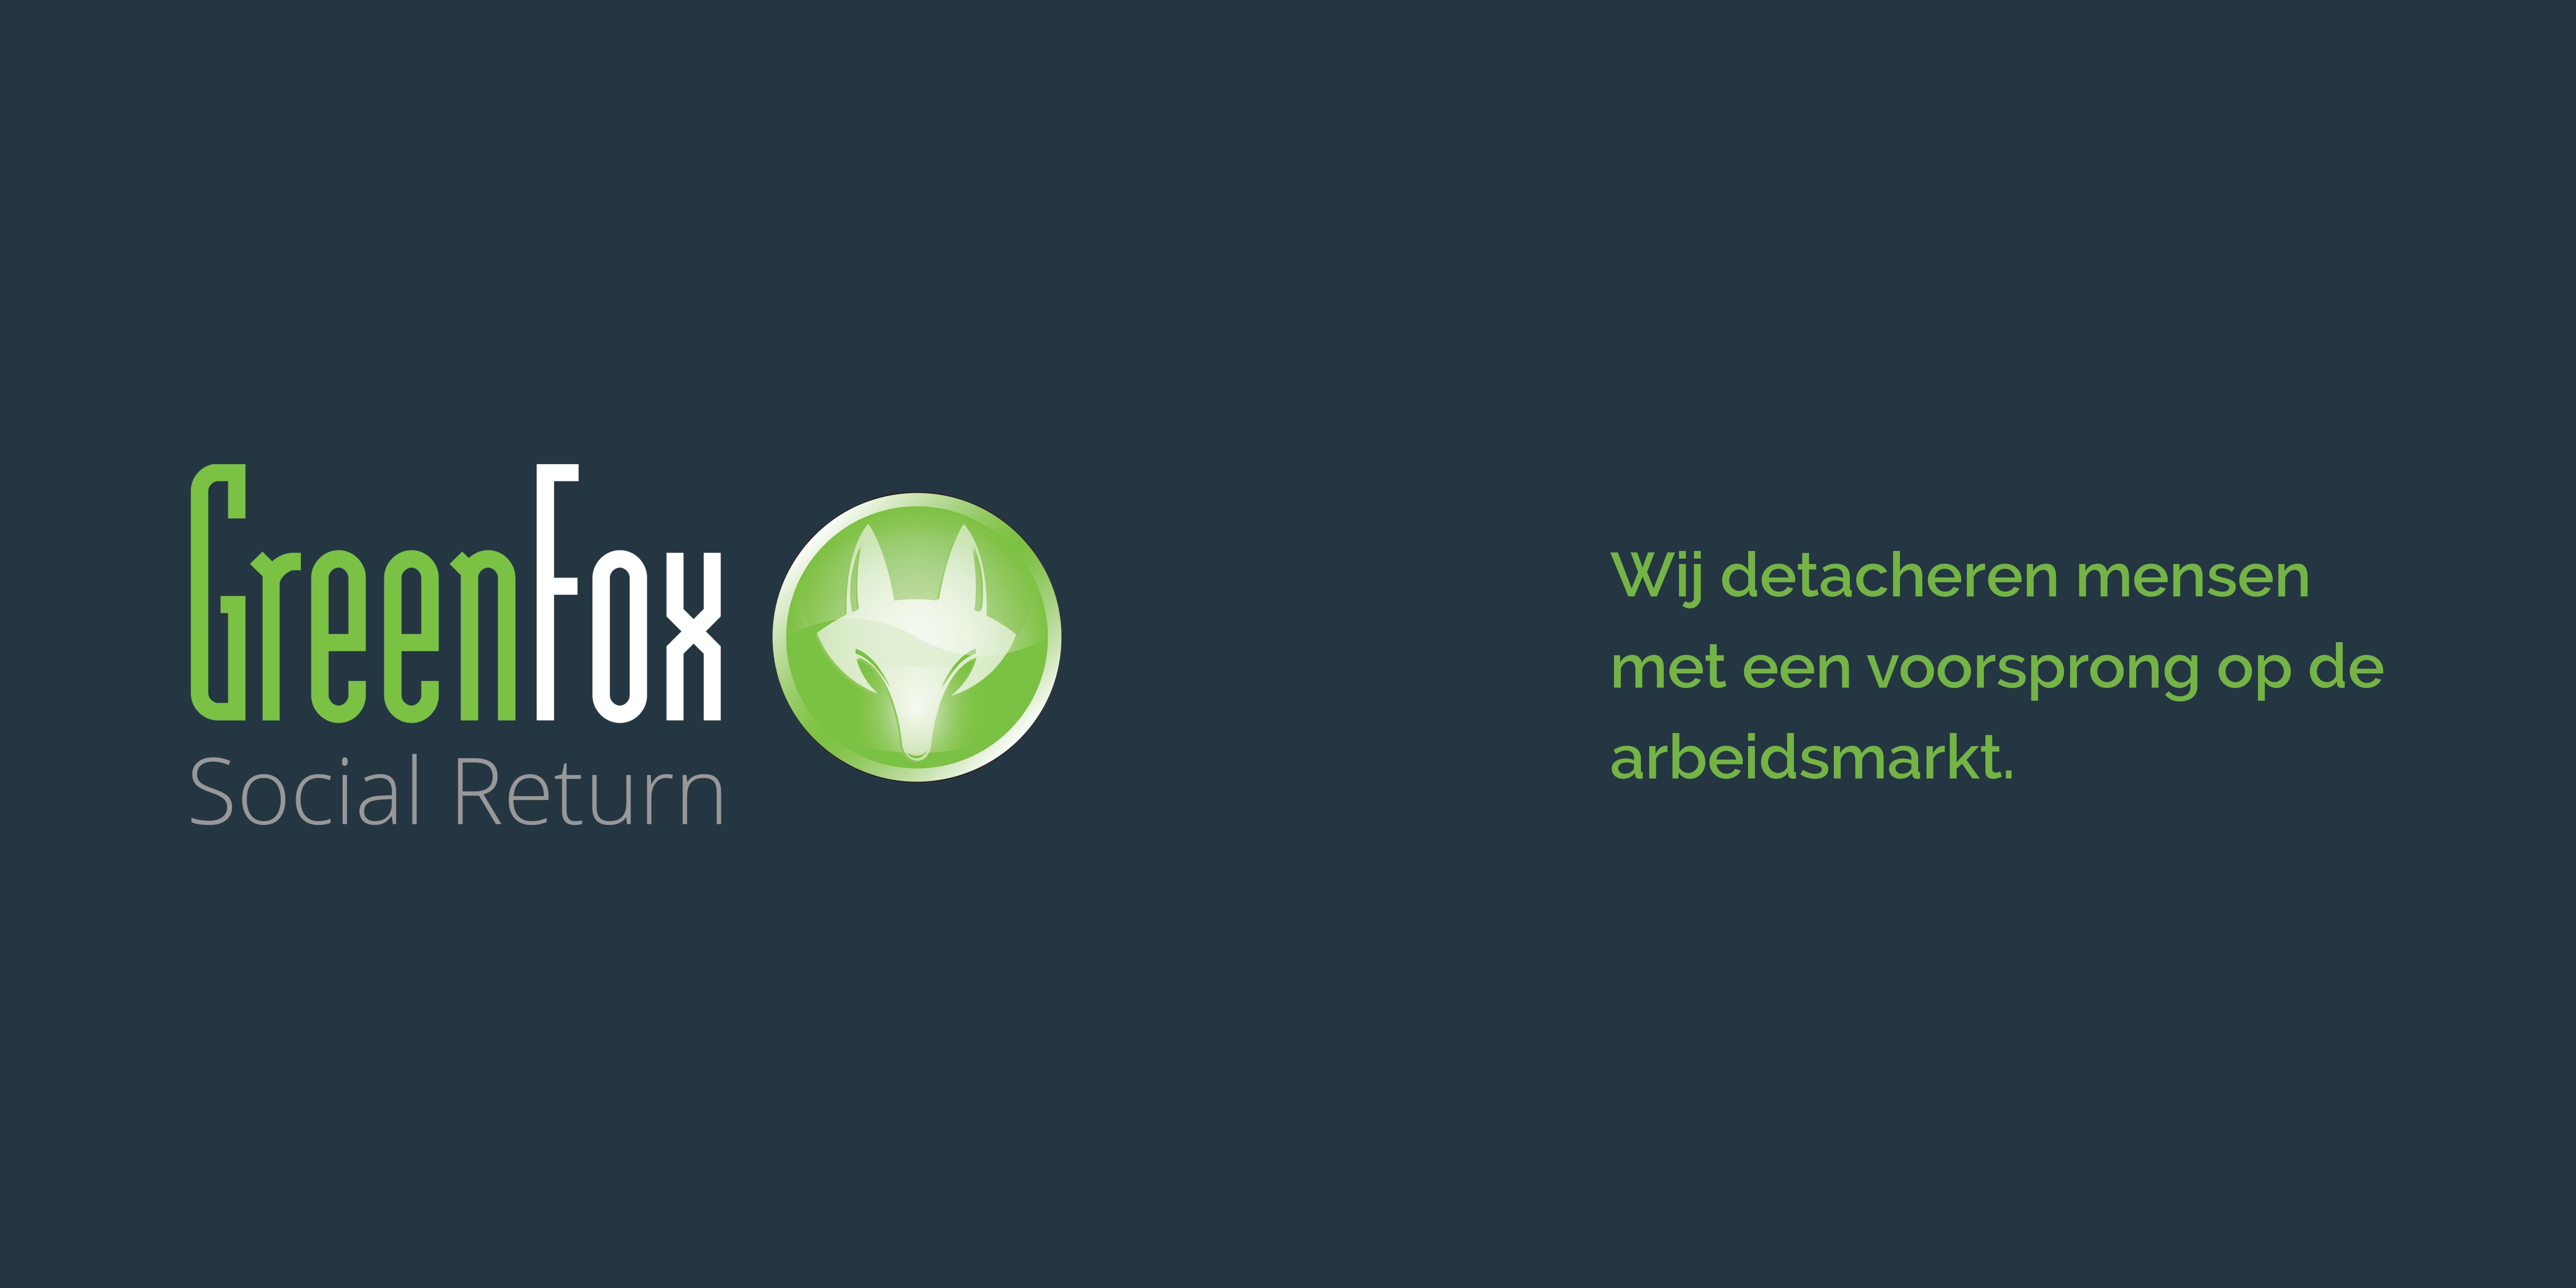 GreenFox Social Return